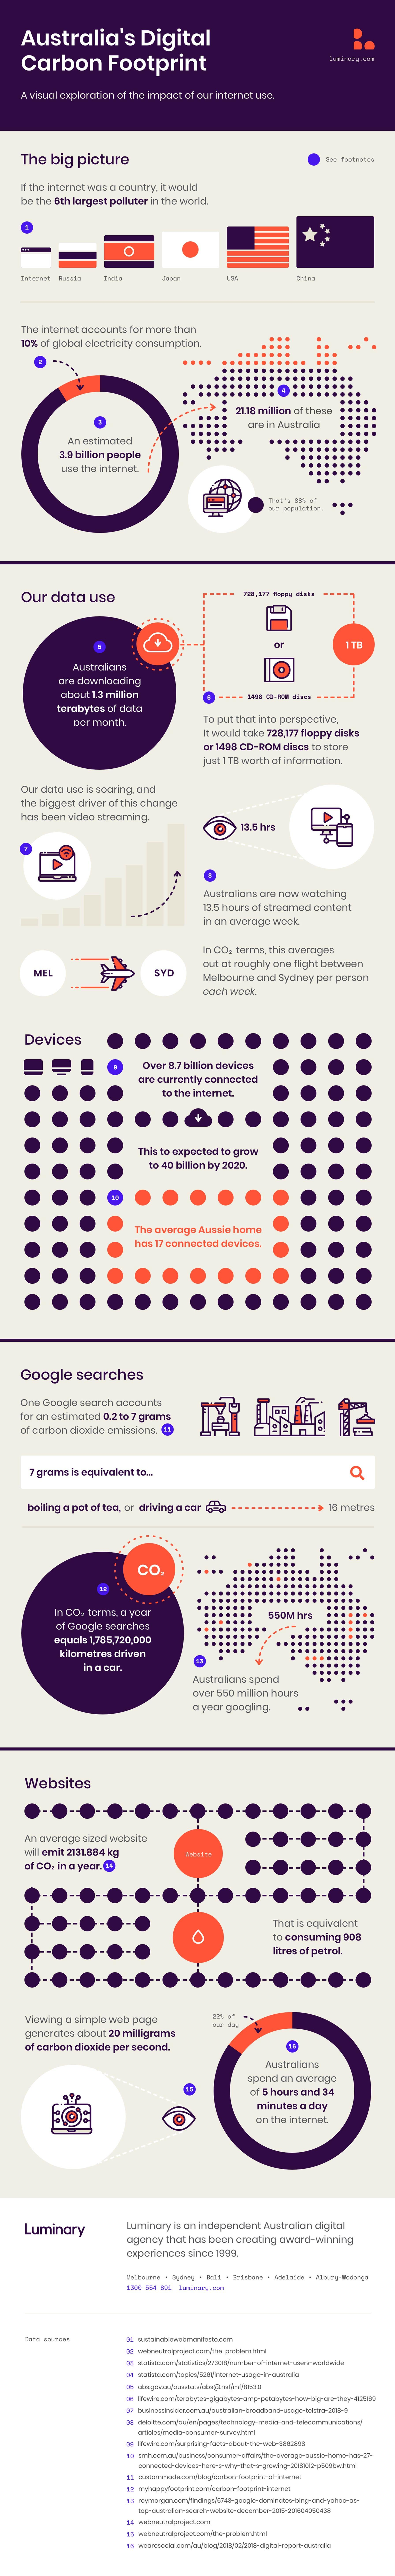 Infographic - Australia's Digital Footprint